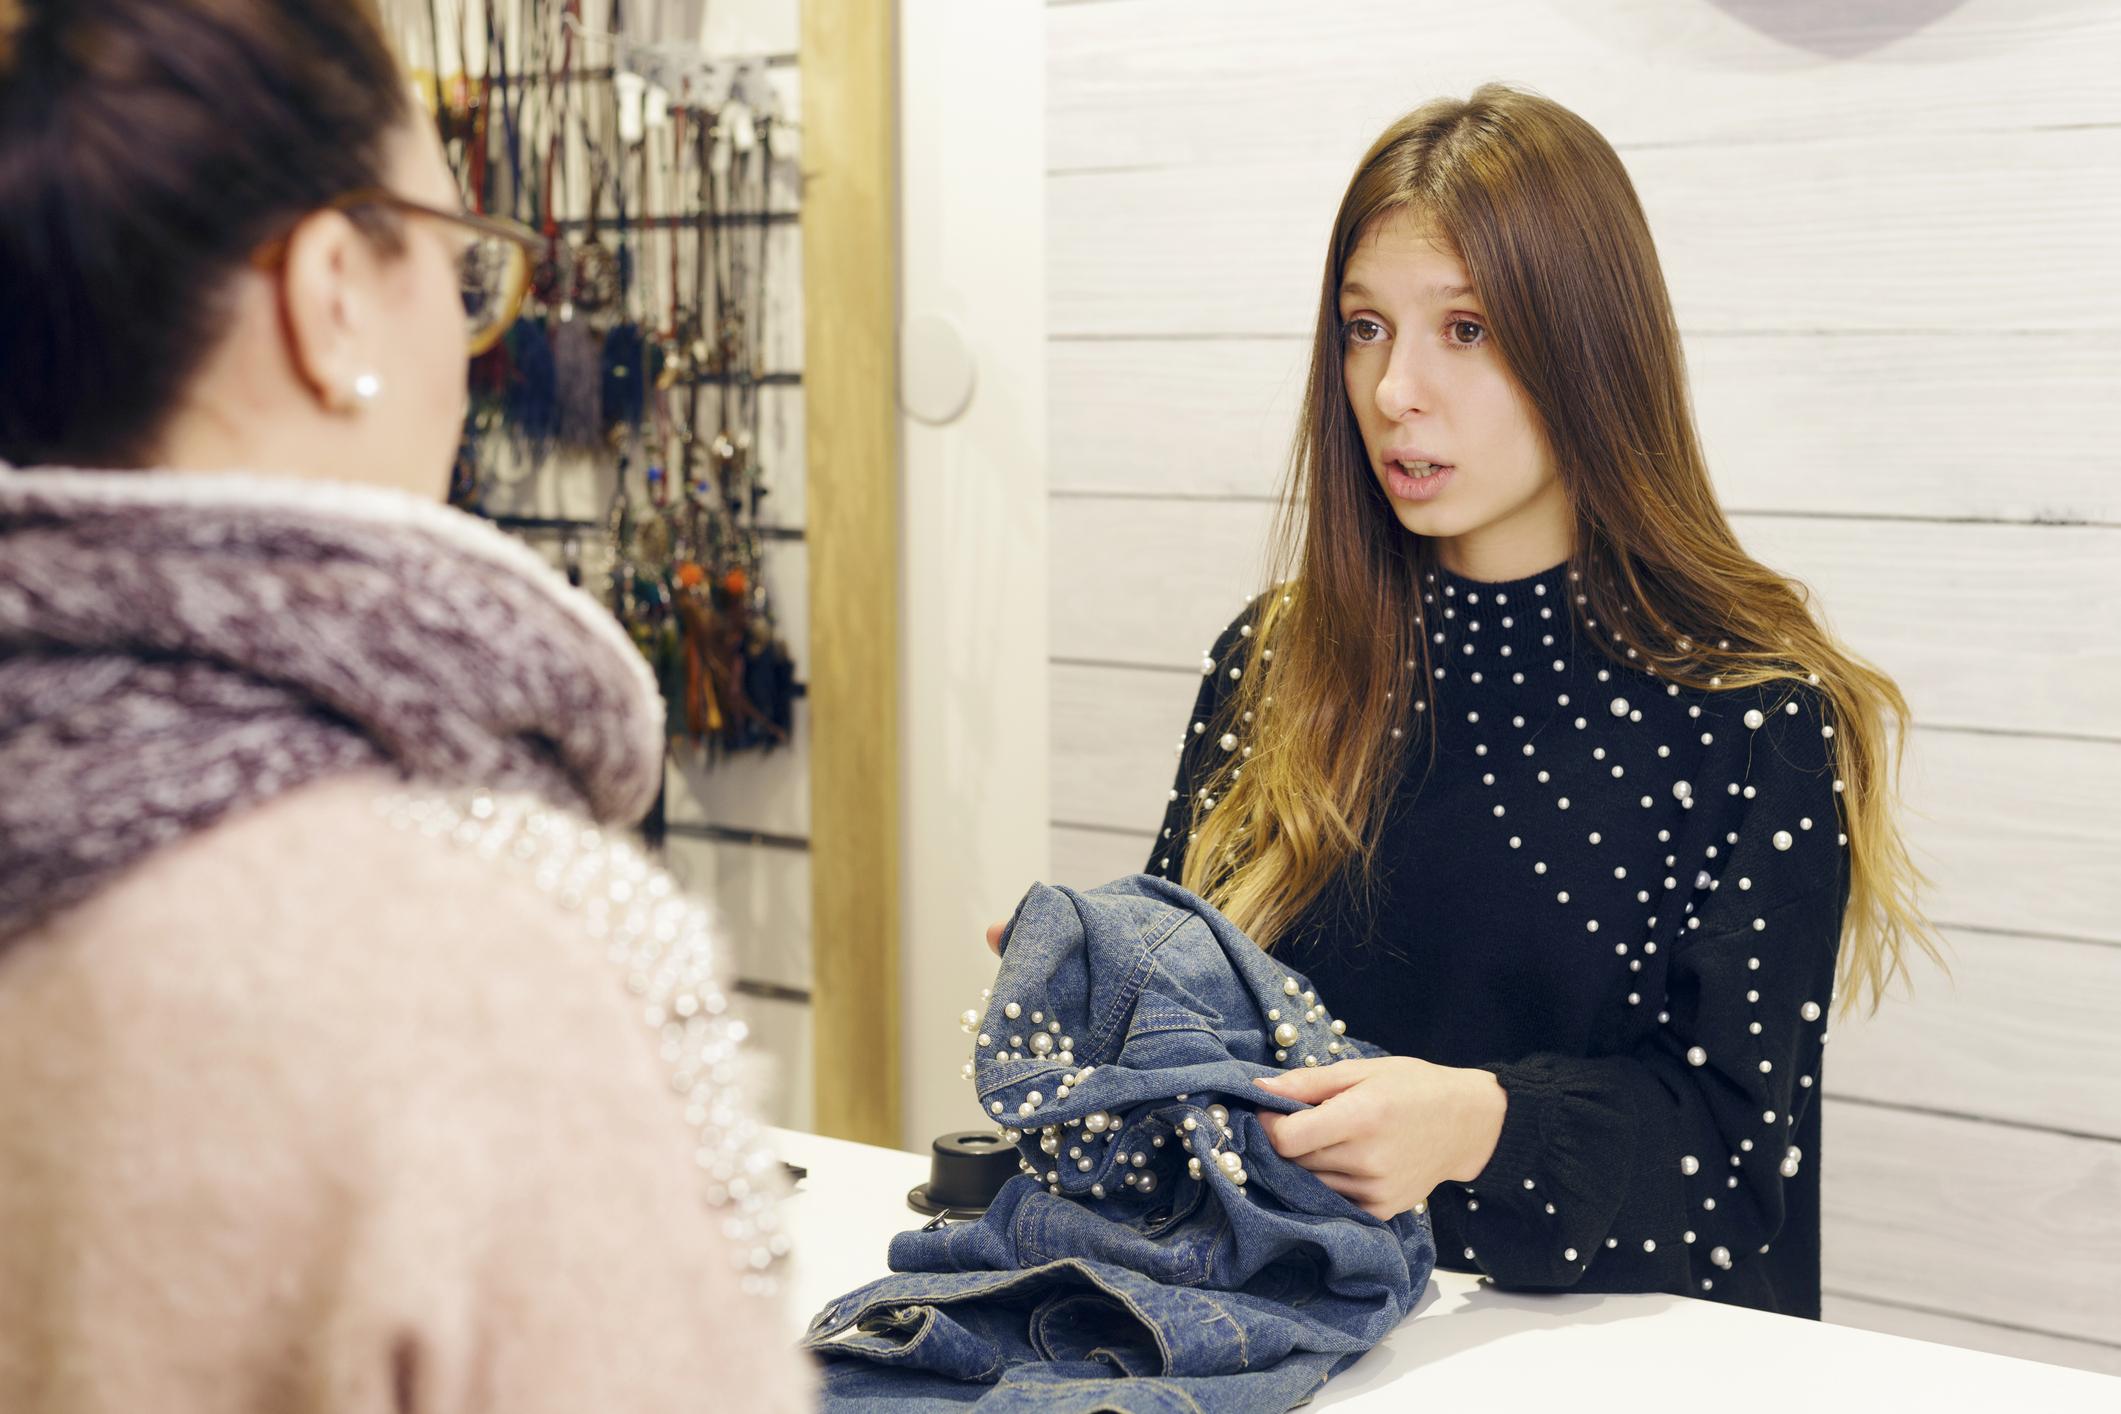 A woman ringing up a customer at a clothing store.